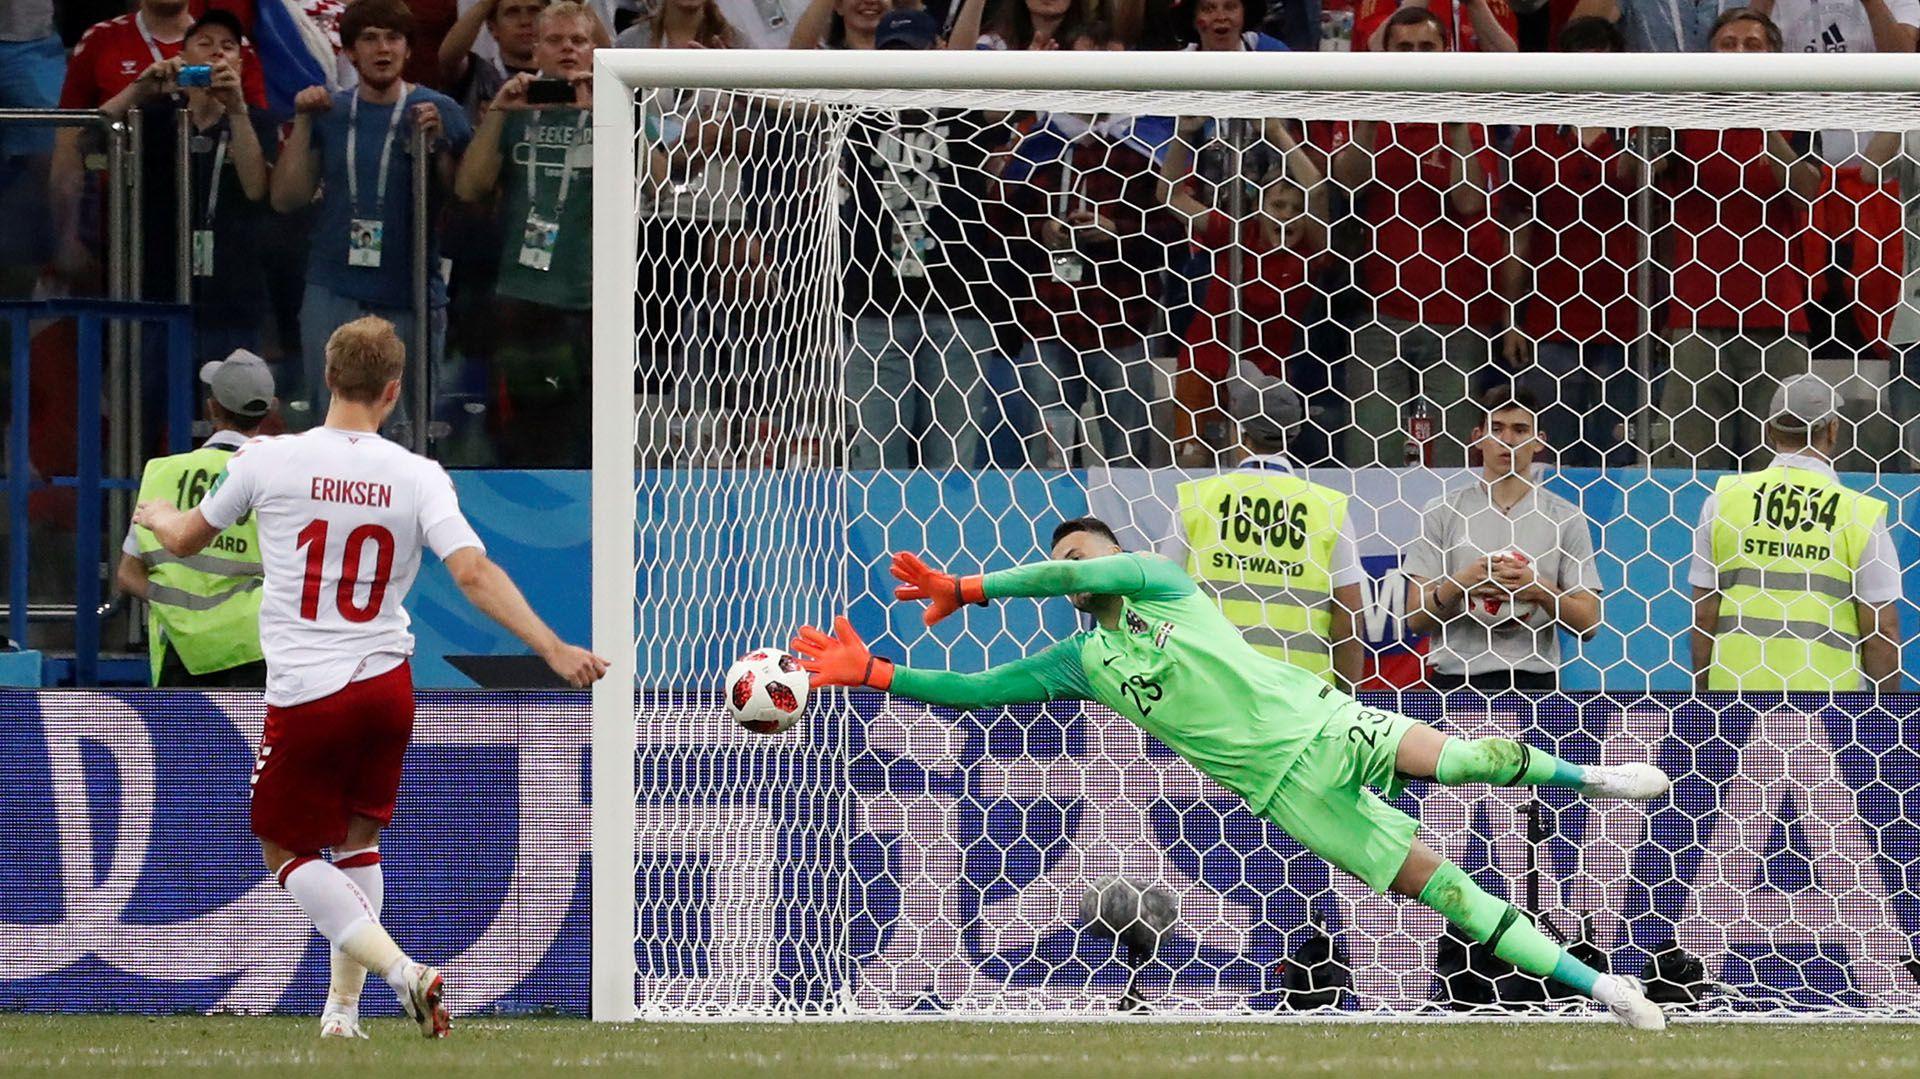 Eriksen falló un penal contra Croacia en la tanda por los octavos de final del Mundial de Rusia 2018 (REUTERS/Damir Sagolj)